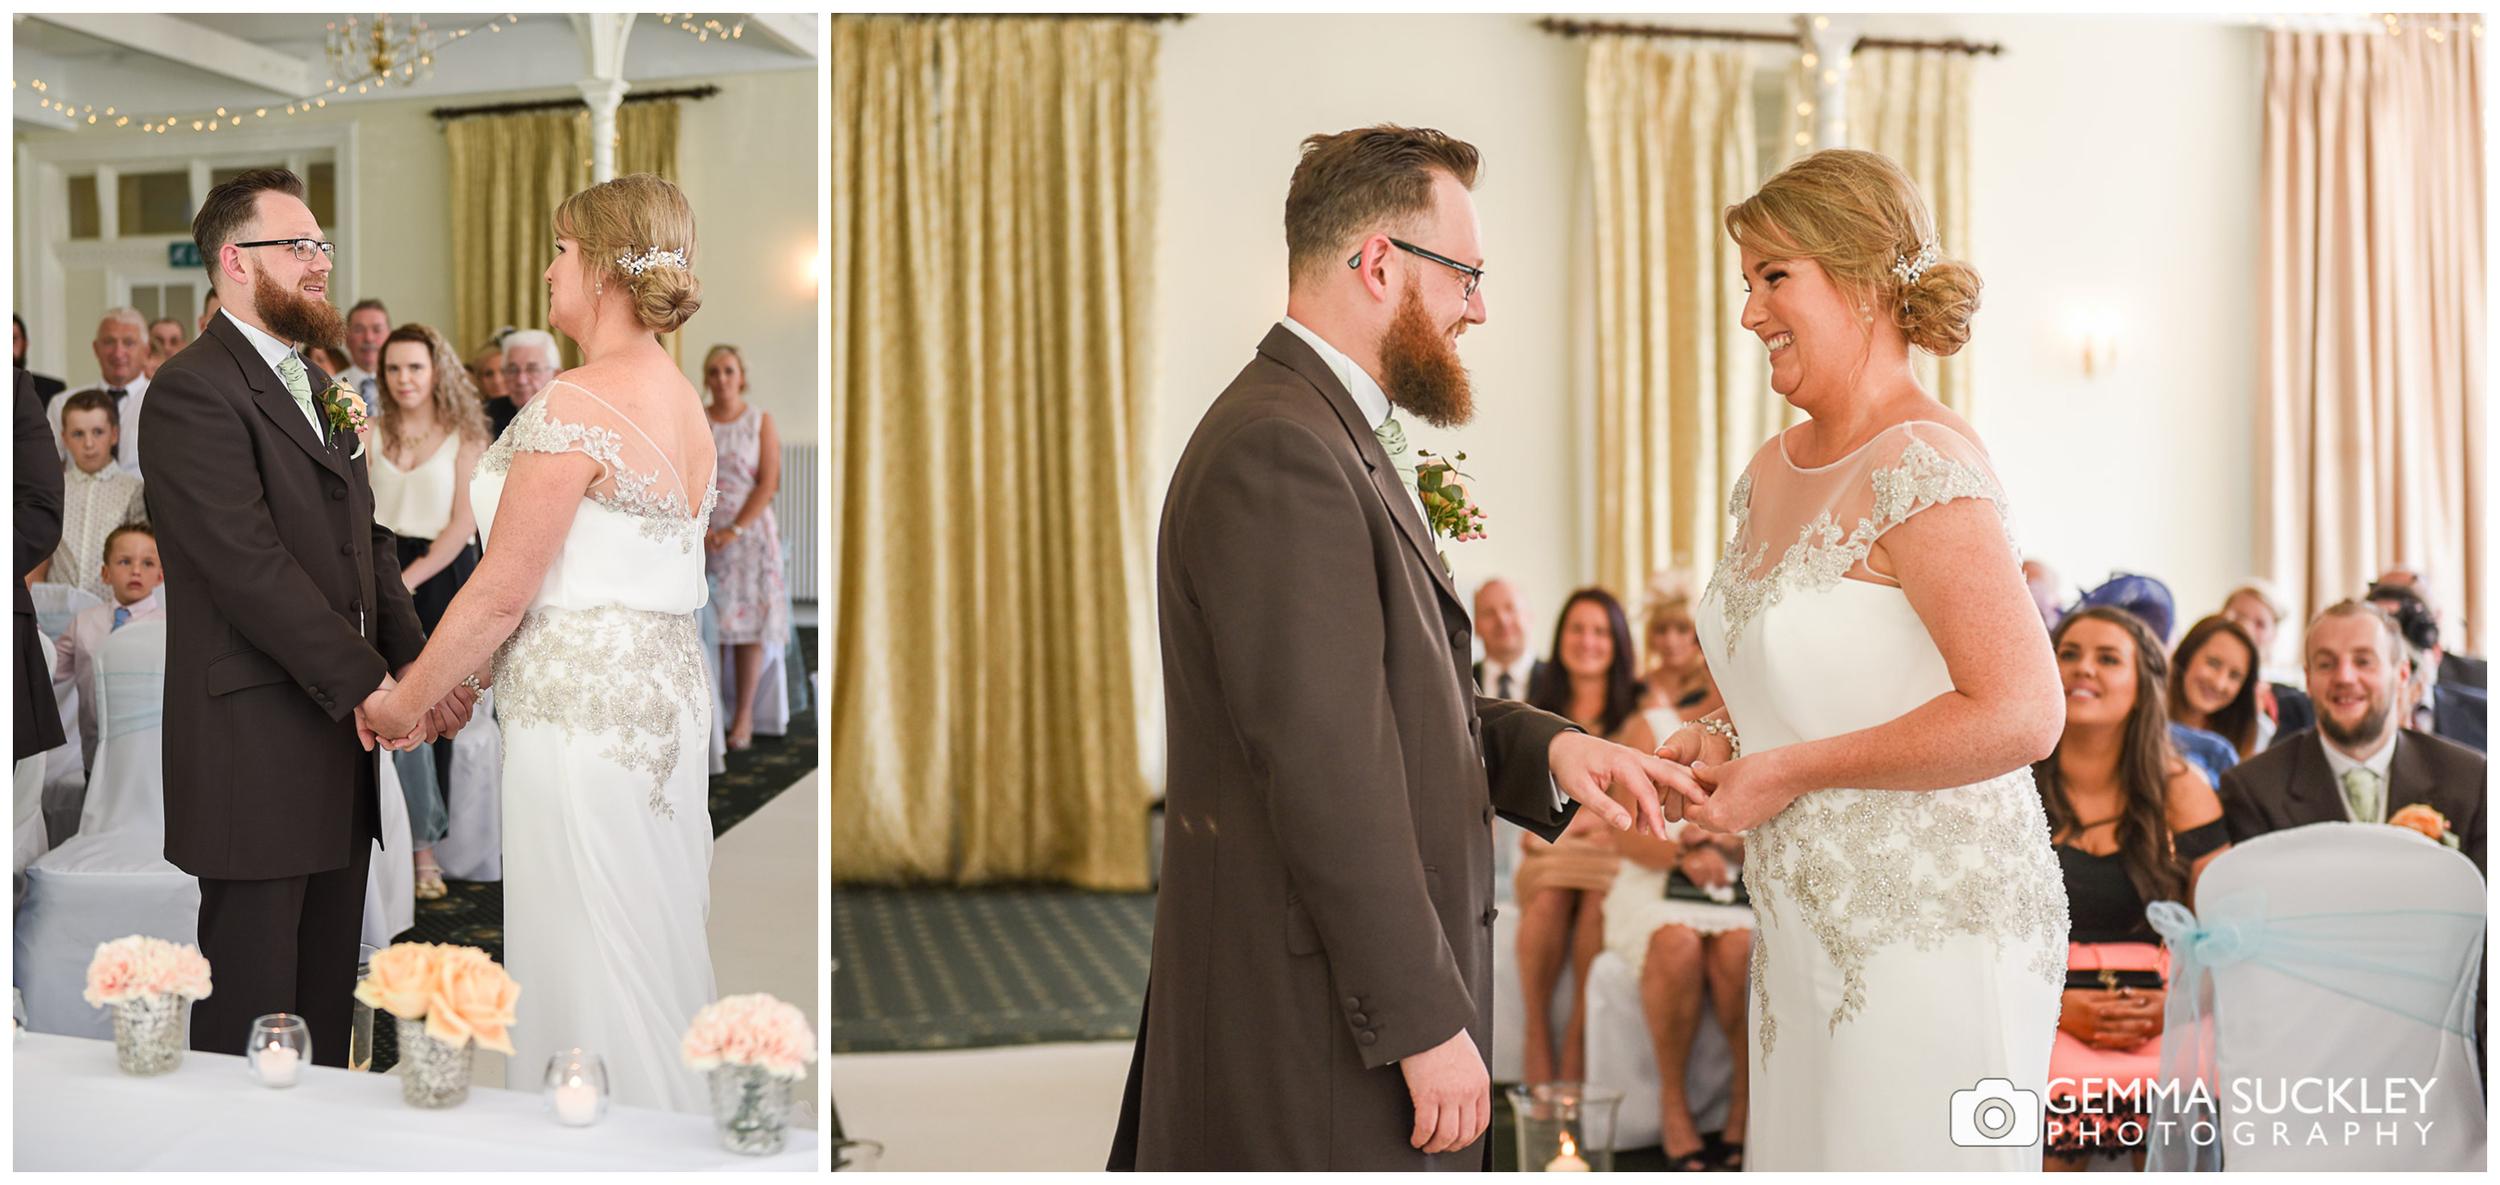 wedding-ceremony-the-old-swan©gemmasuckleyphotography.JPG